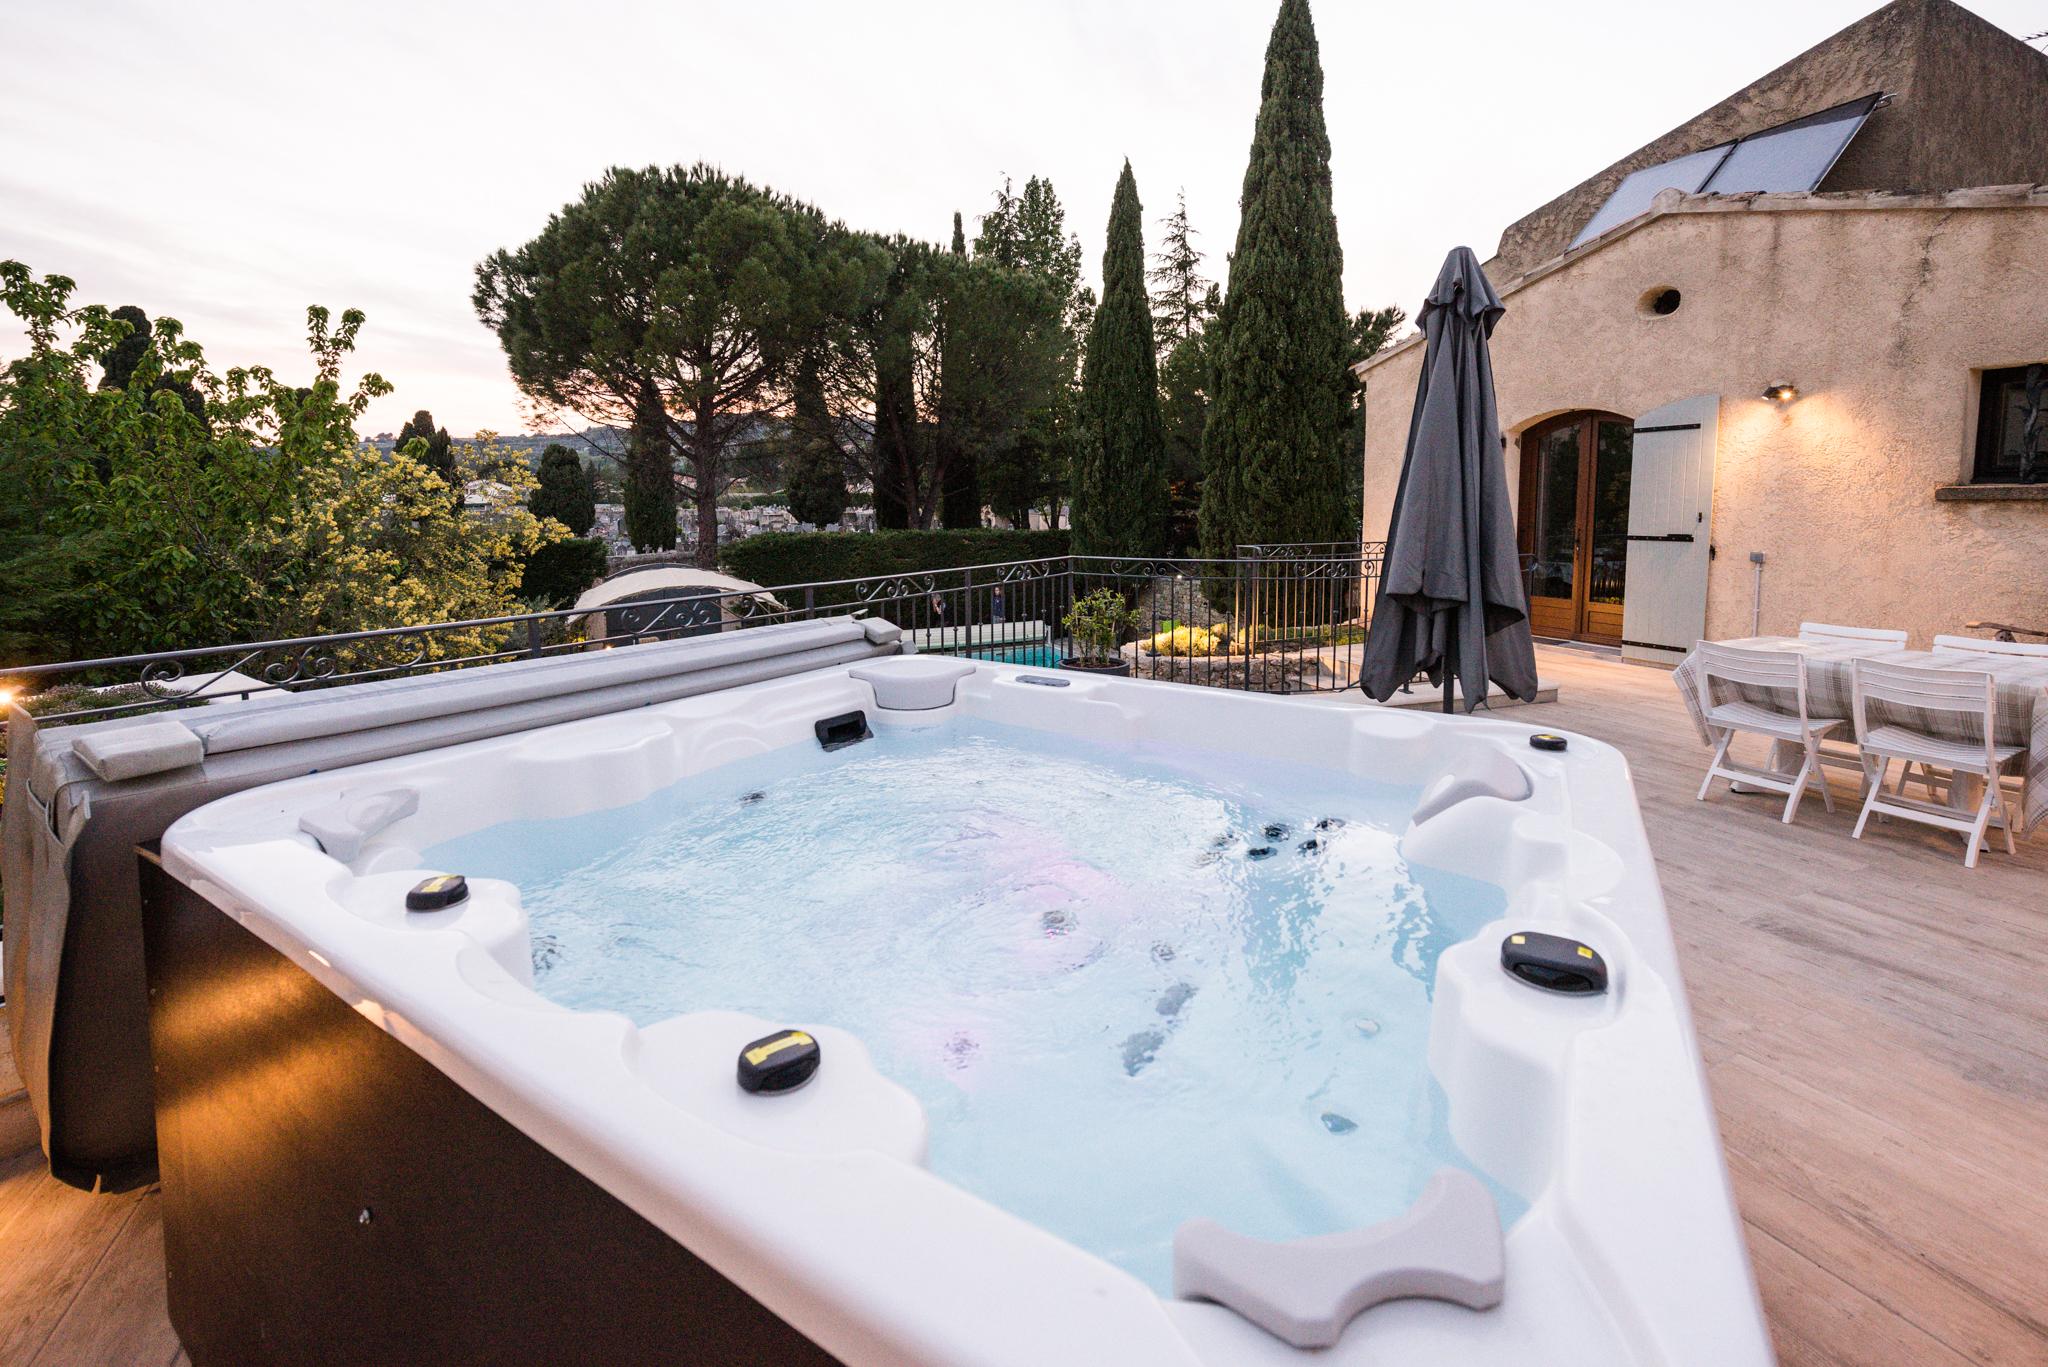 feriebolig-frankrig-sauna-pool-DSC_4754.jpg